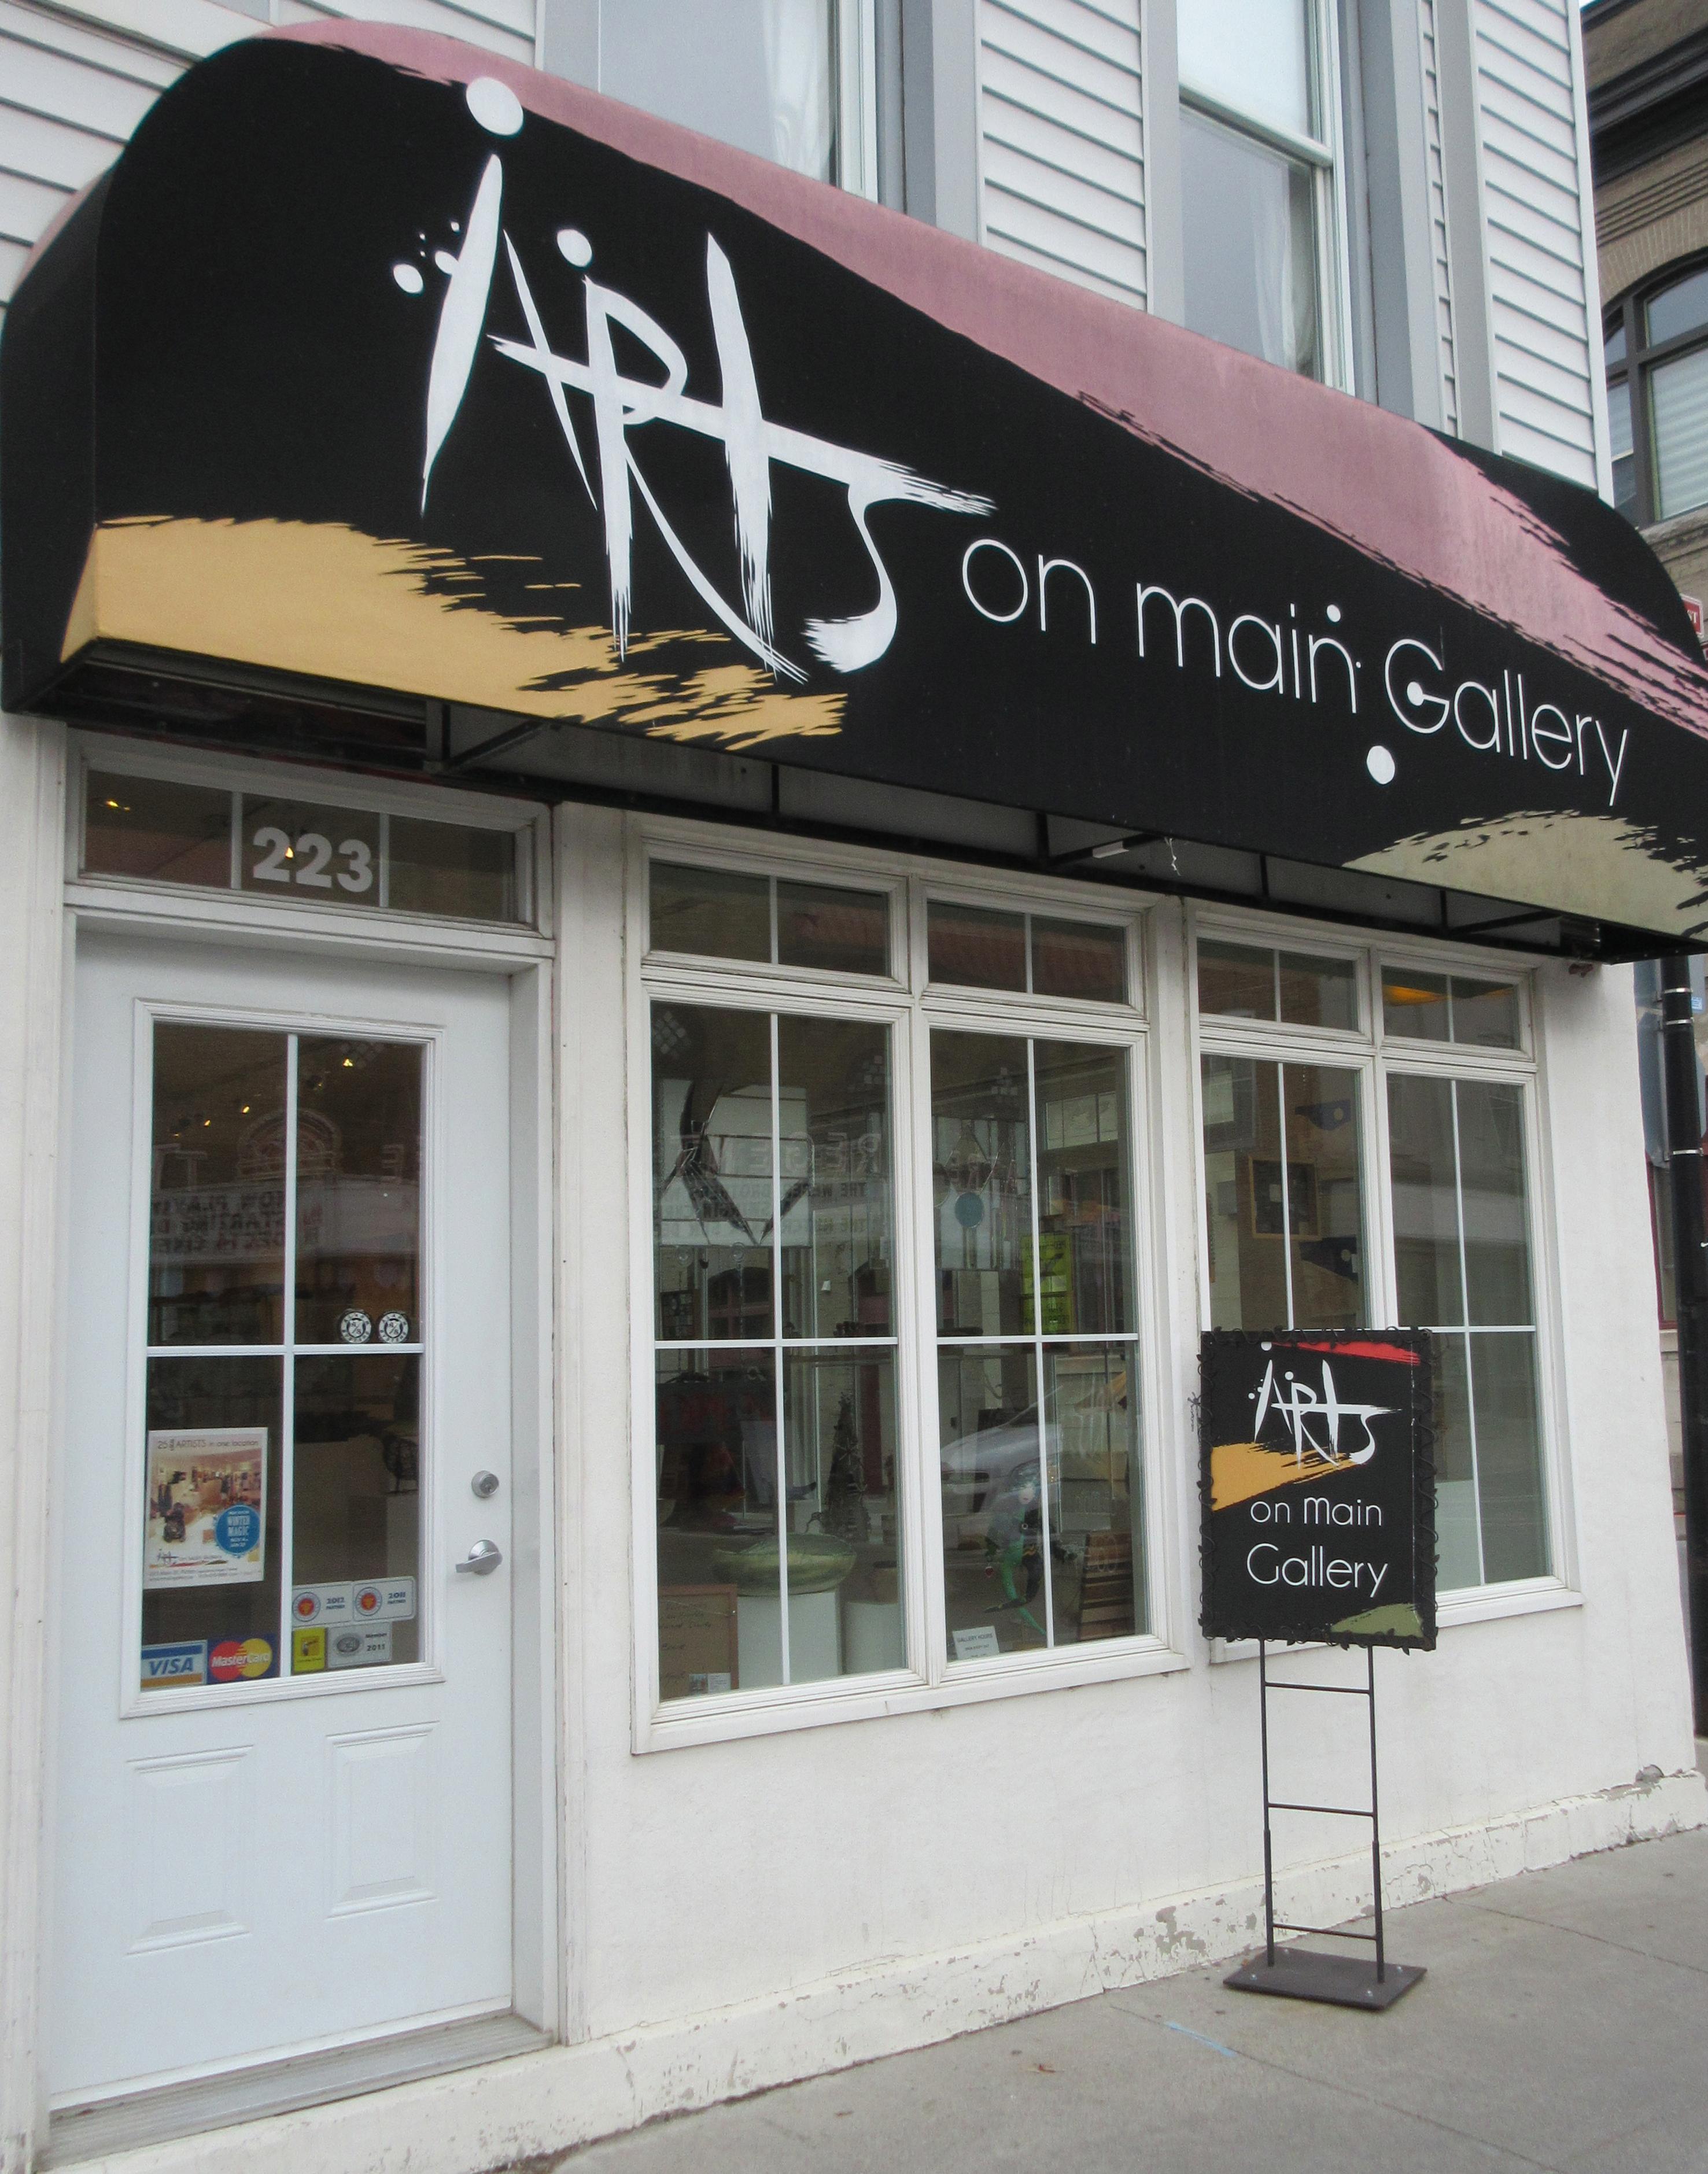 Arts on Main Gallery